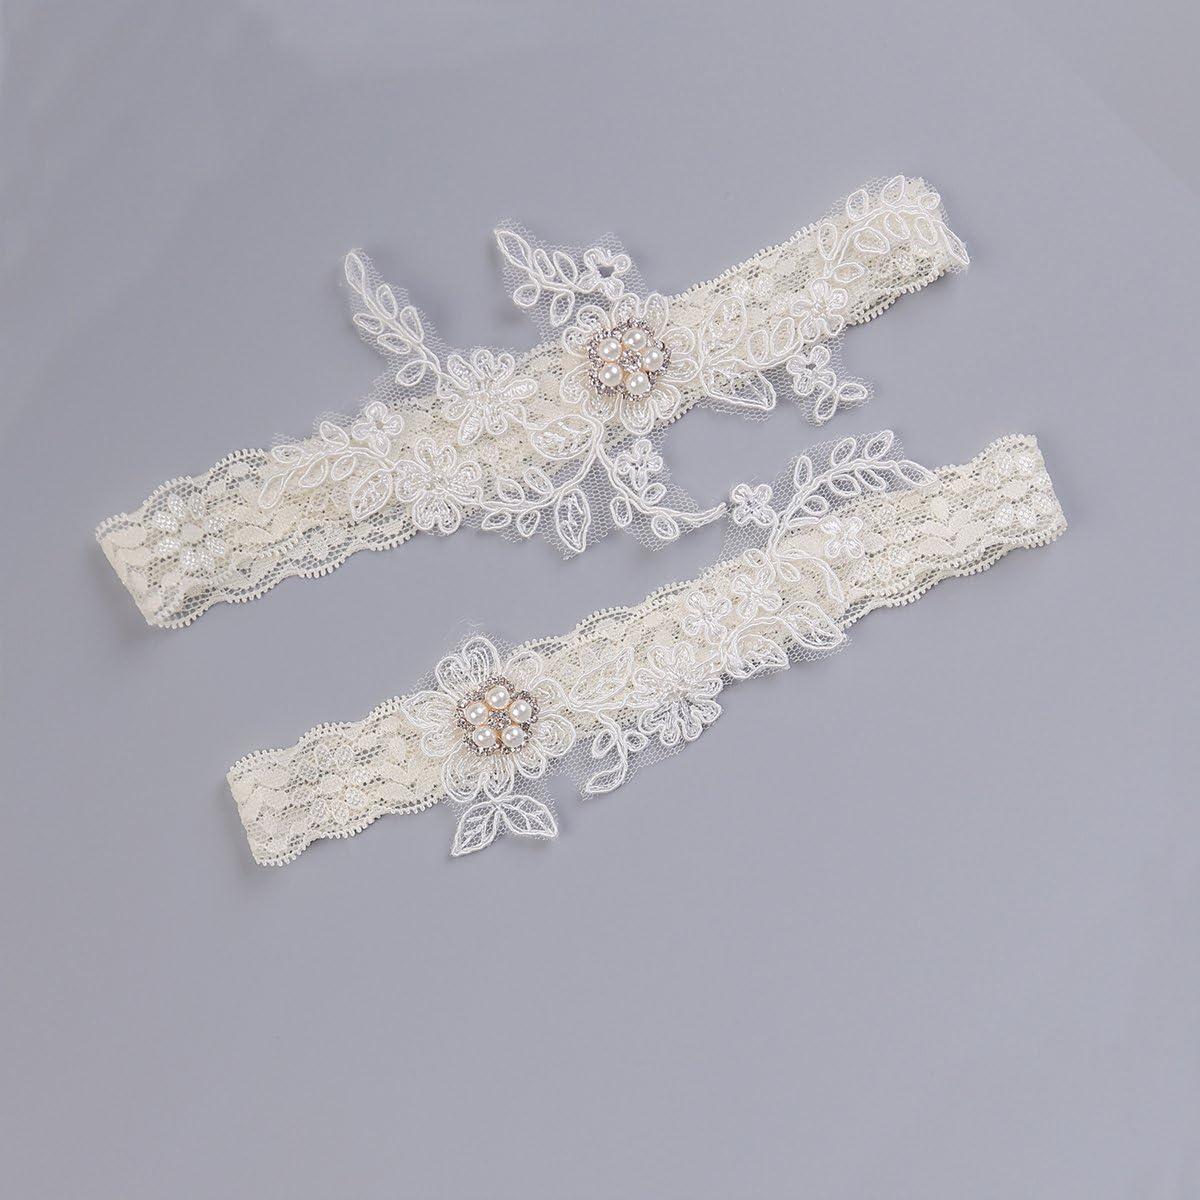 Blanc, Noir, Rose Jarretiere Mariage Dentelle Noeud Strass Simple NEUF T